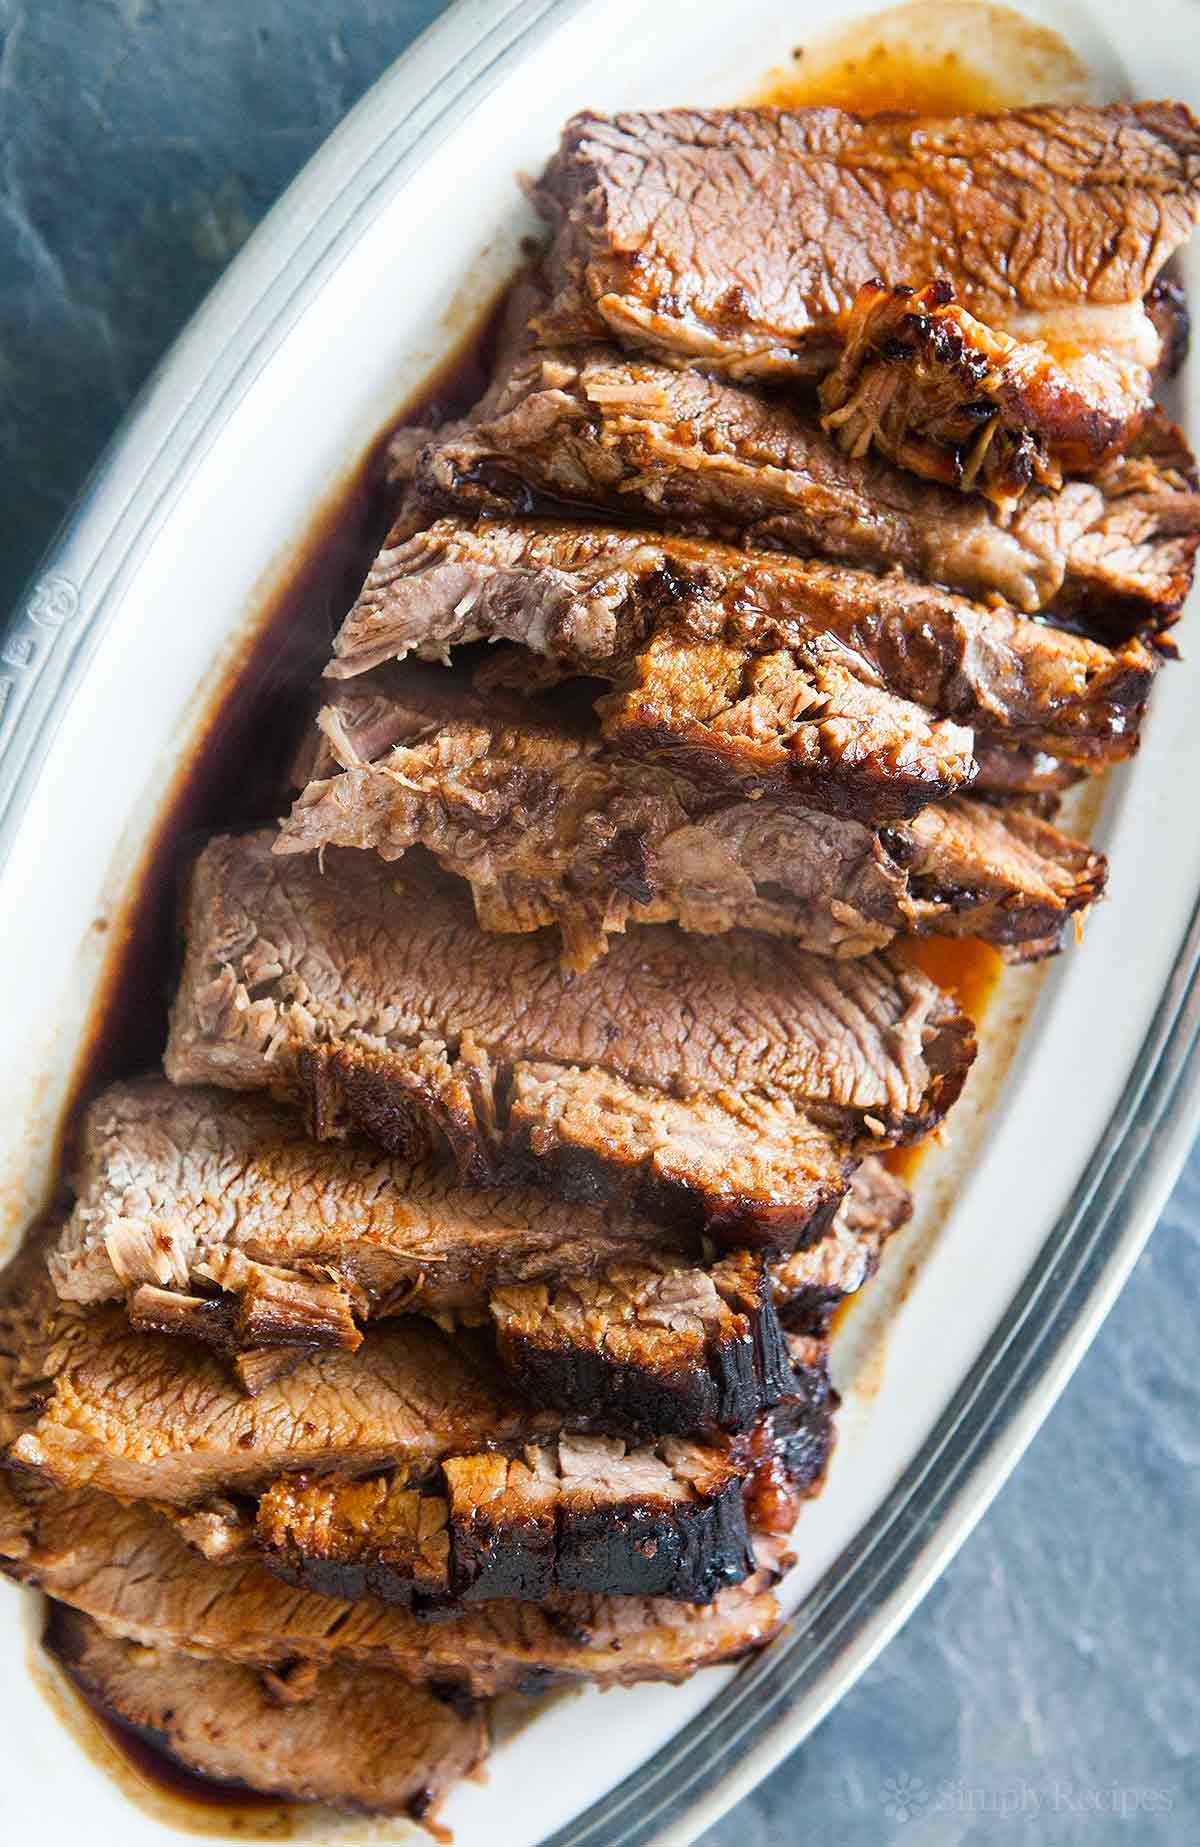 Bbq Beef Brisket Recipe  Easy Beef Brisket Recipe